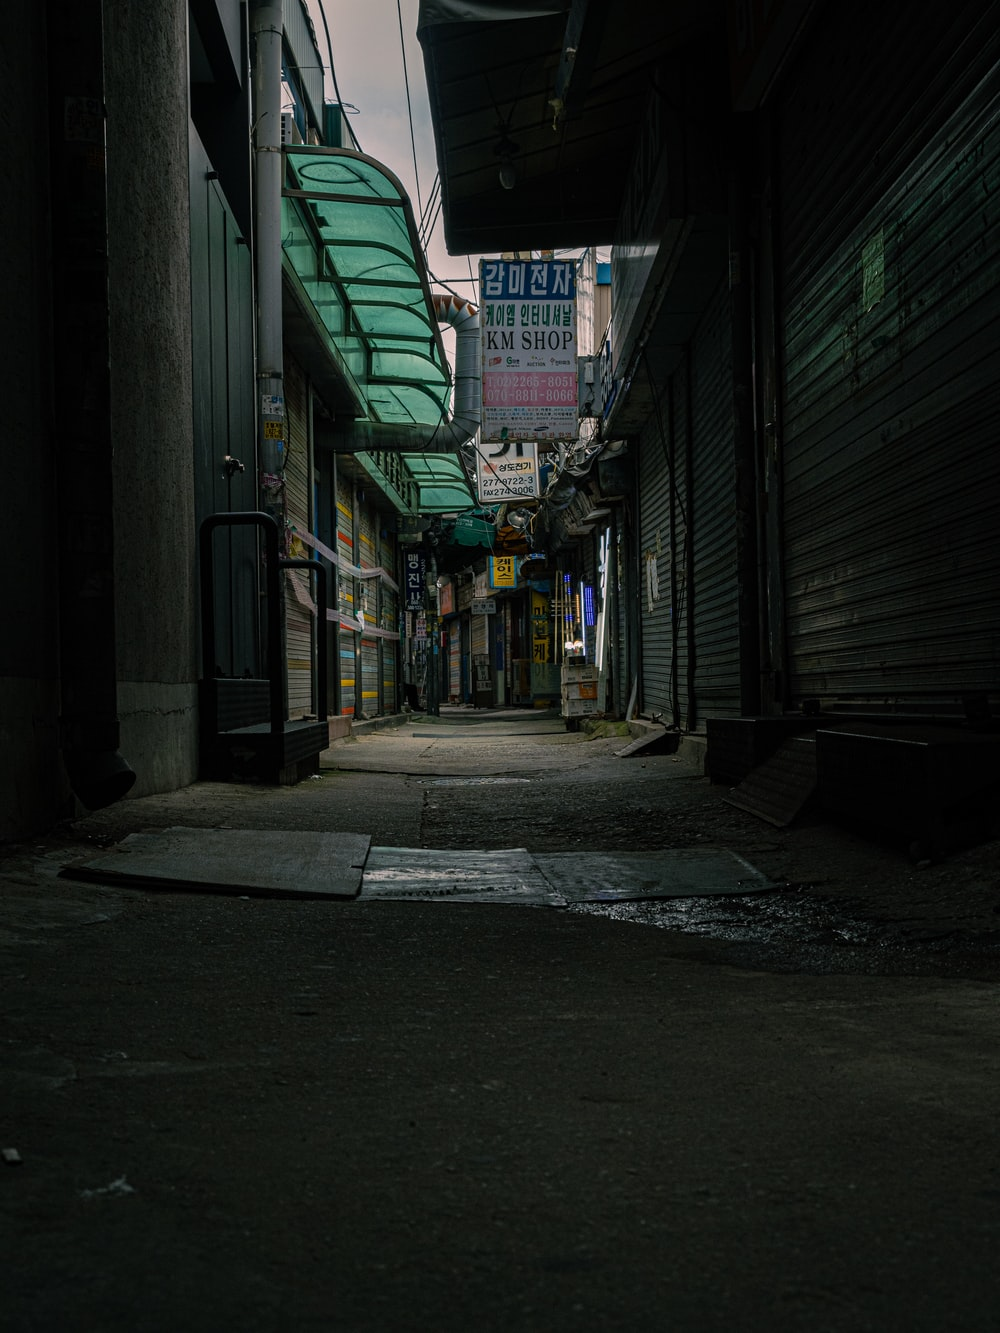 empty hallway with green walls